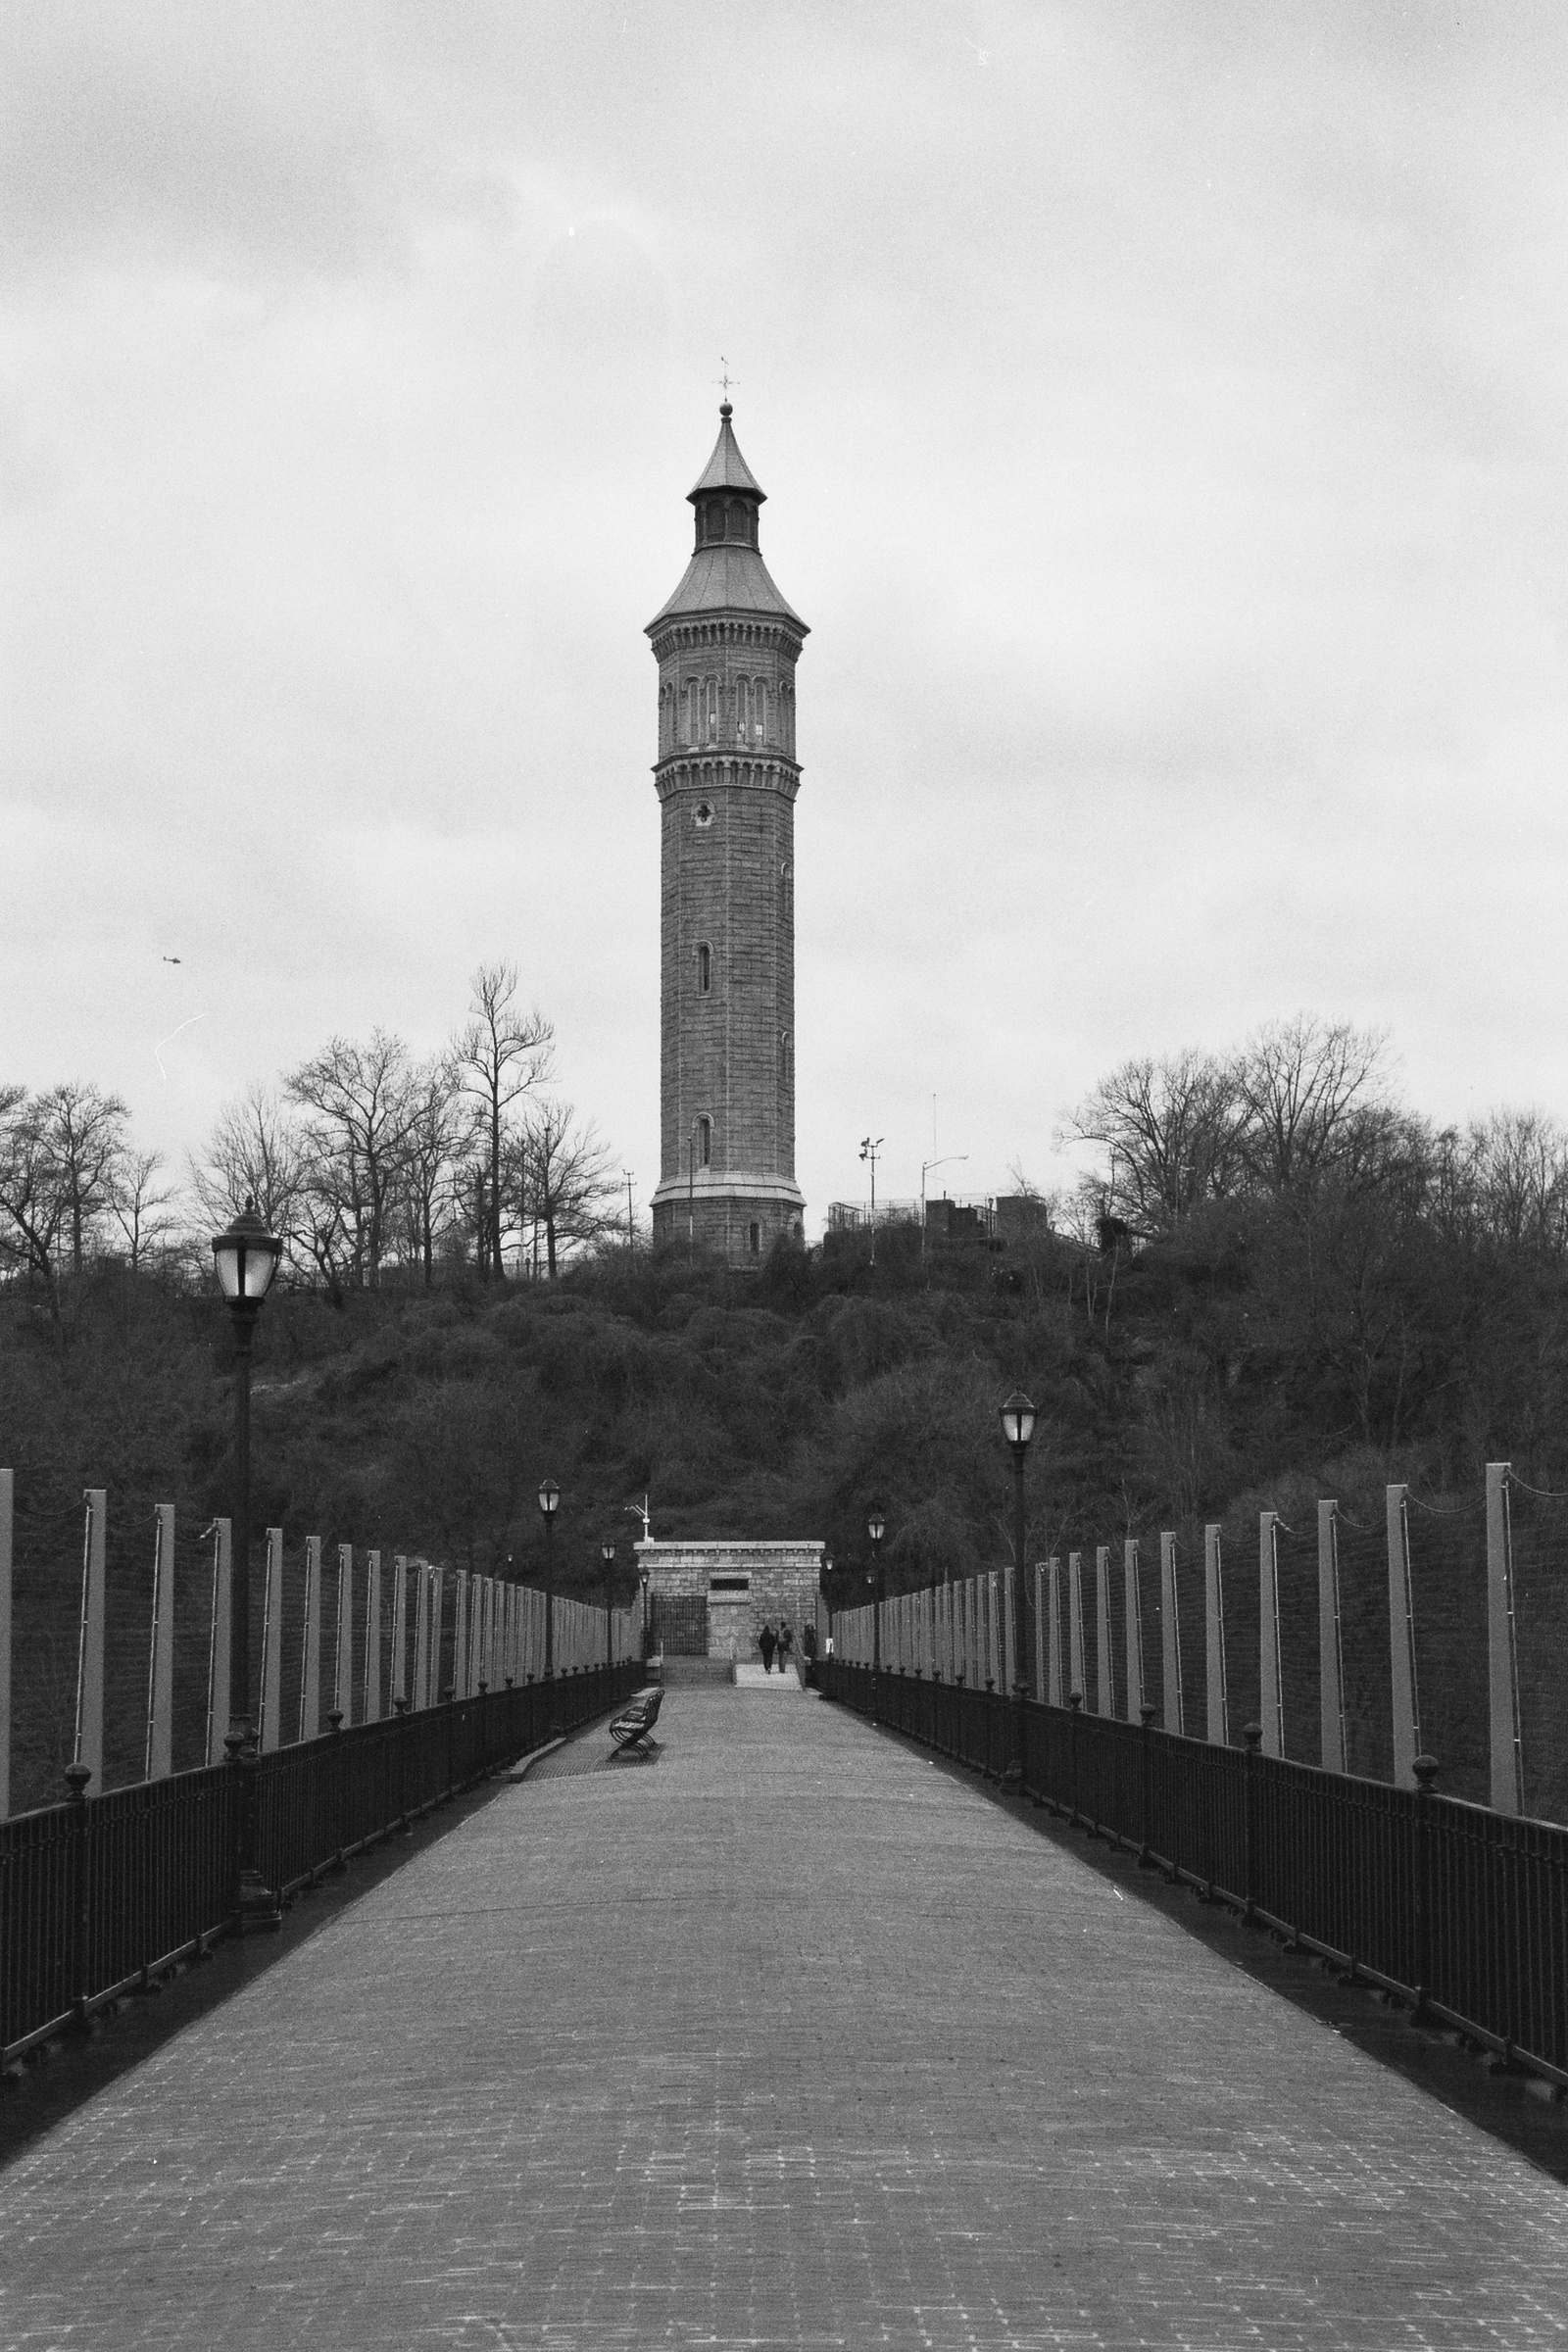 The High Bridge Water Tower as seen from the bridge, looking back towards Washington Heights. New York City.  Details :  film, 35mm Ilford Delta 400. Pentax K1000. Fletcher Berryman, 2018.